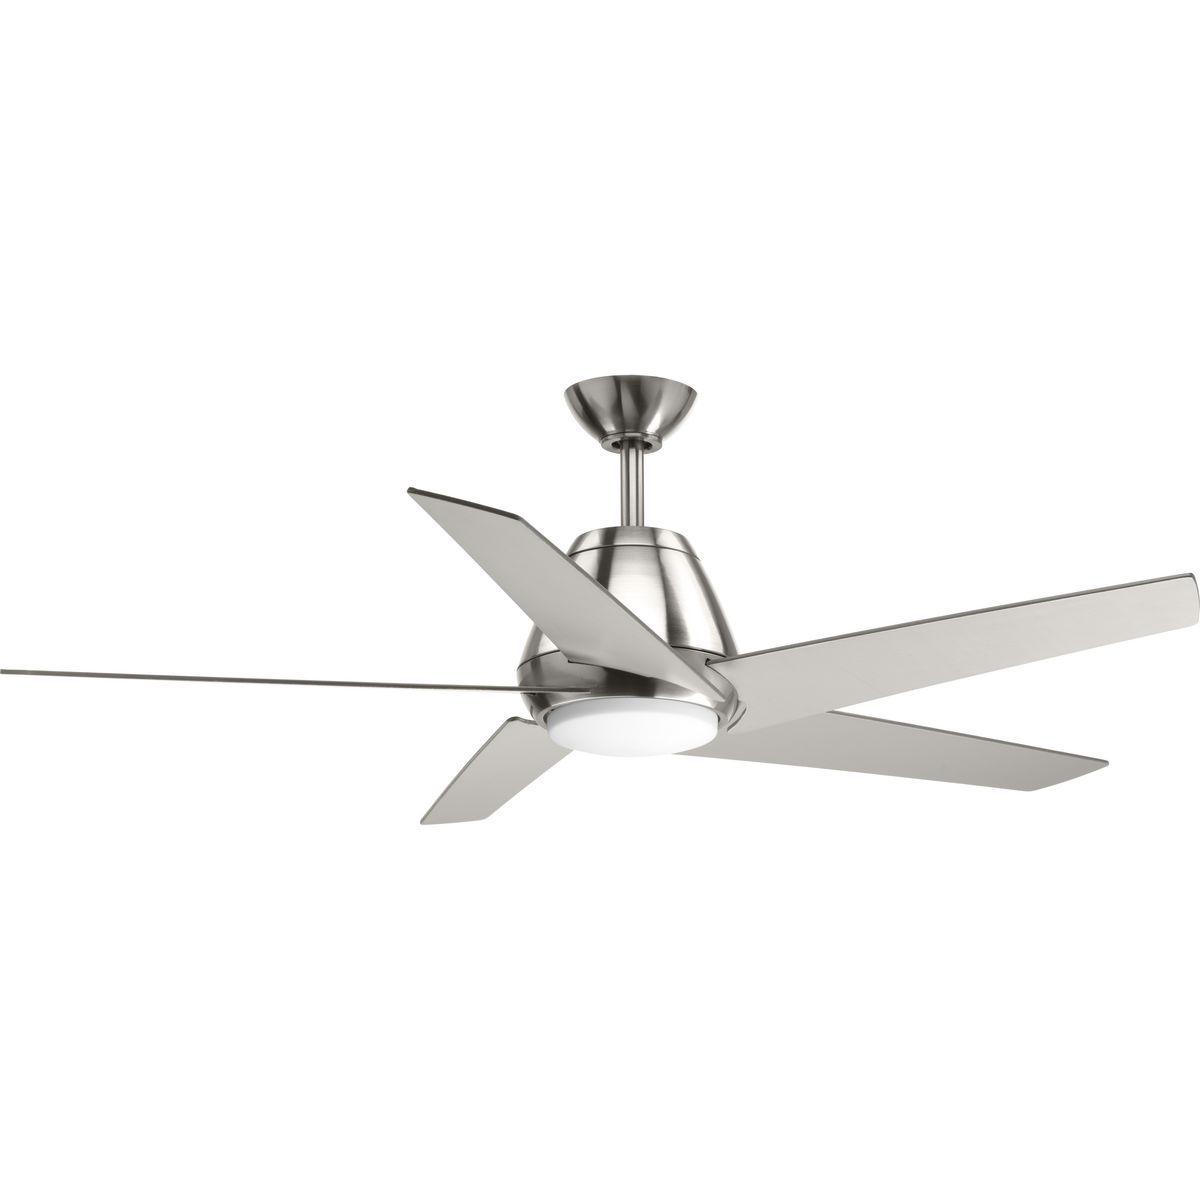 gust 54 ceiling fan this five blade 54 u2033 gust ceiling fan features rh pinterest com